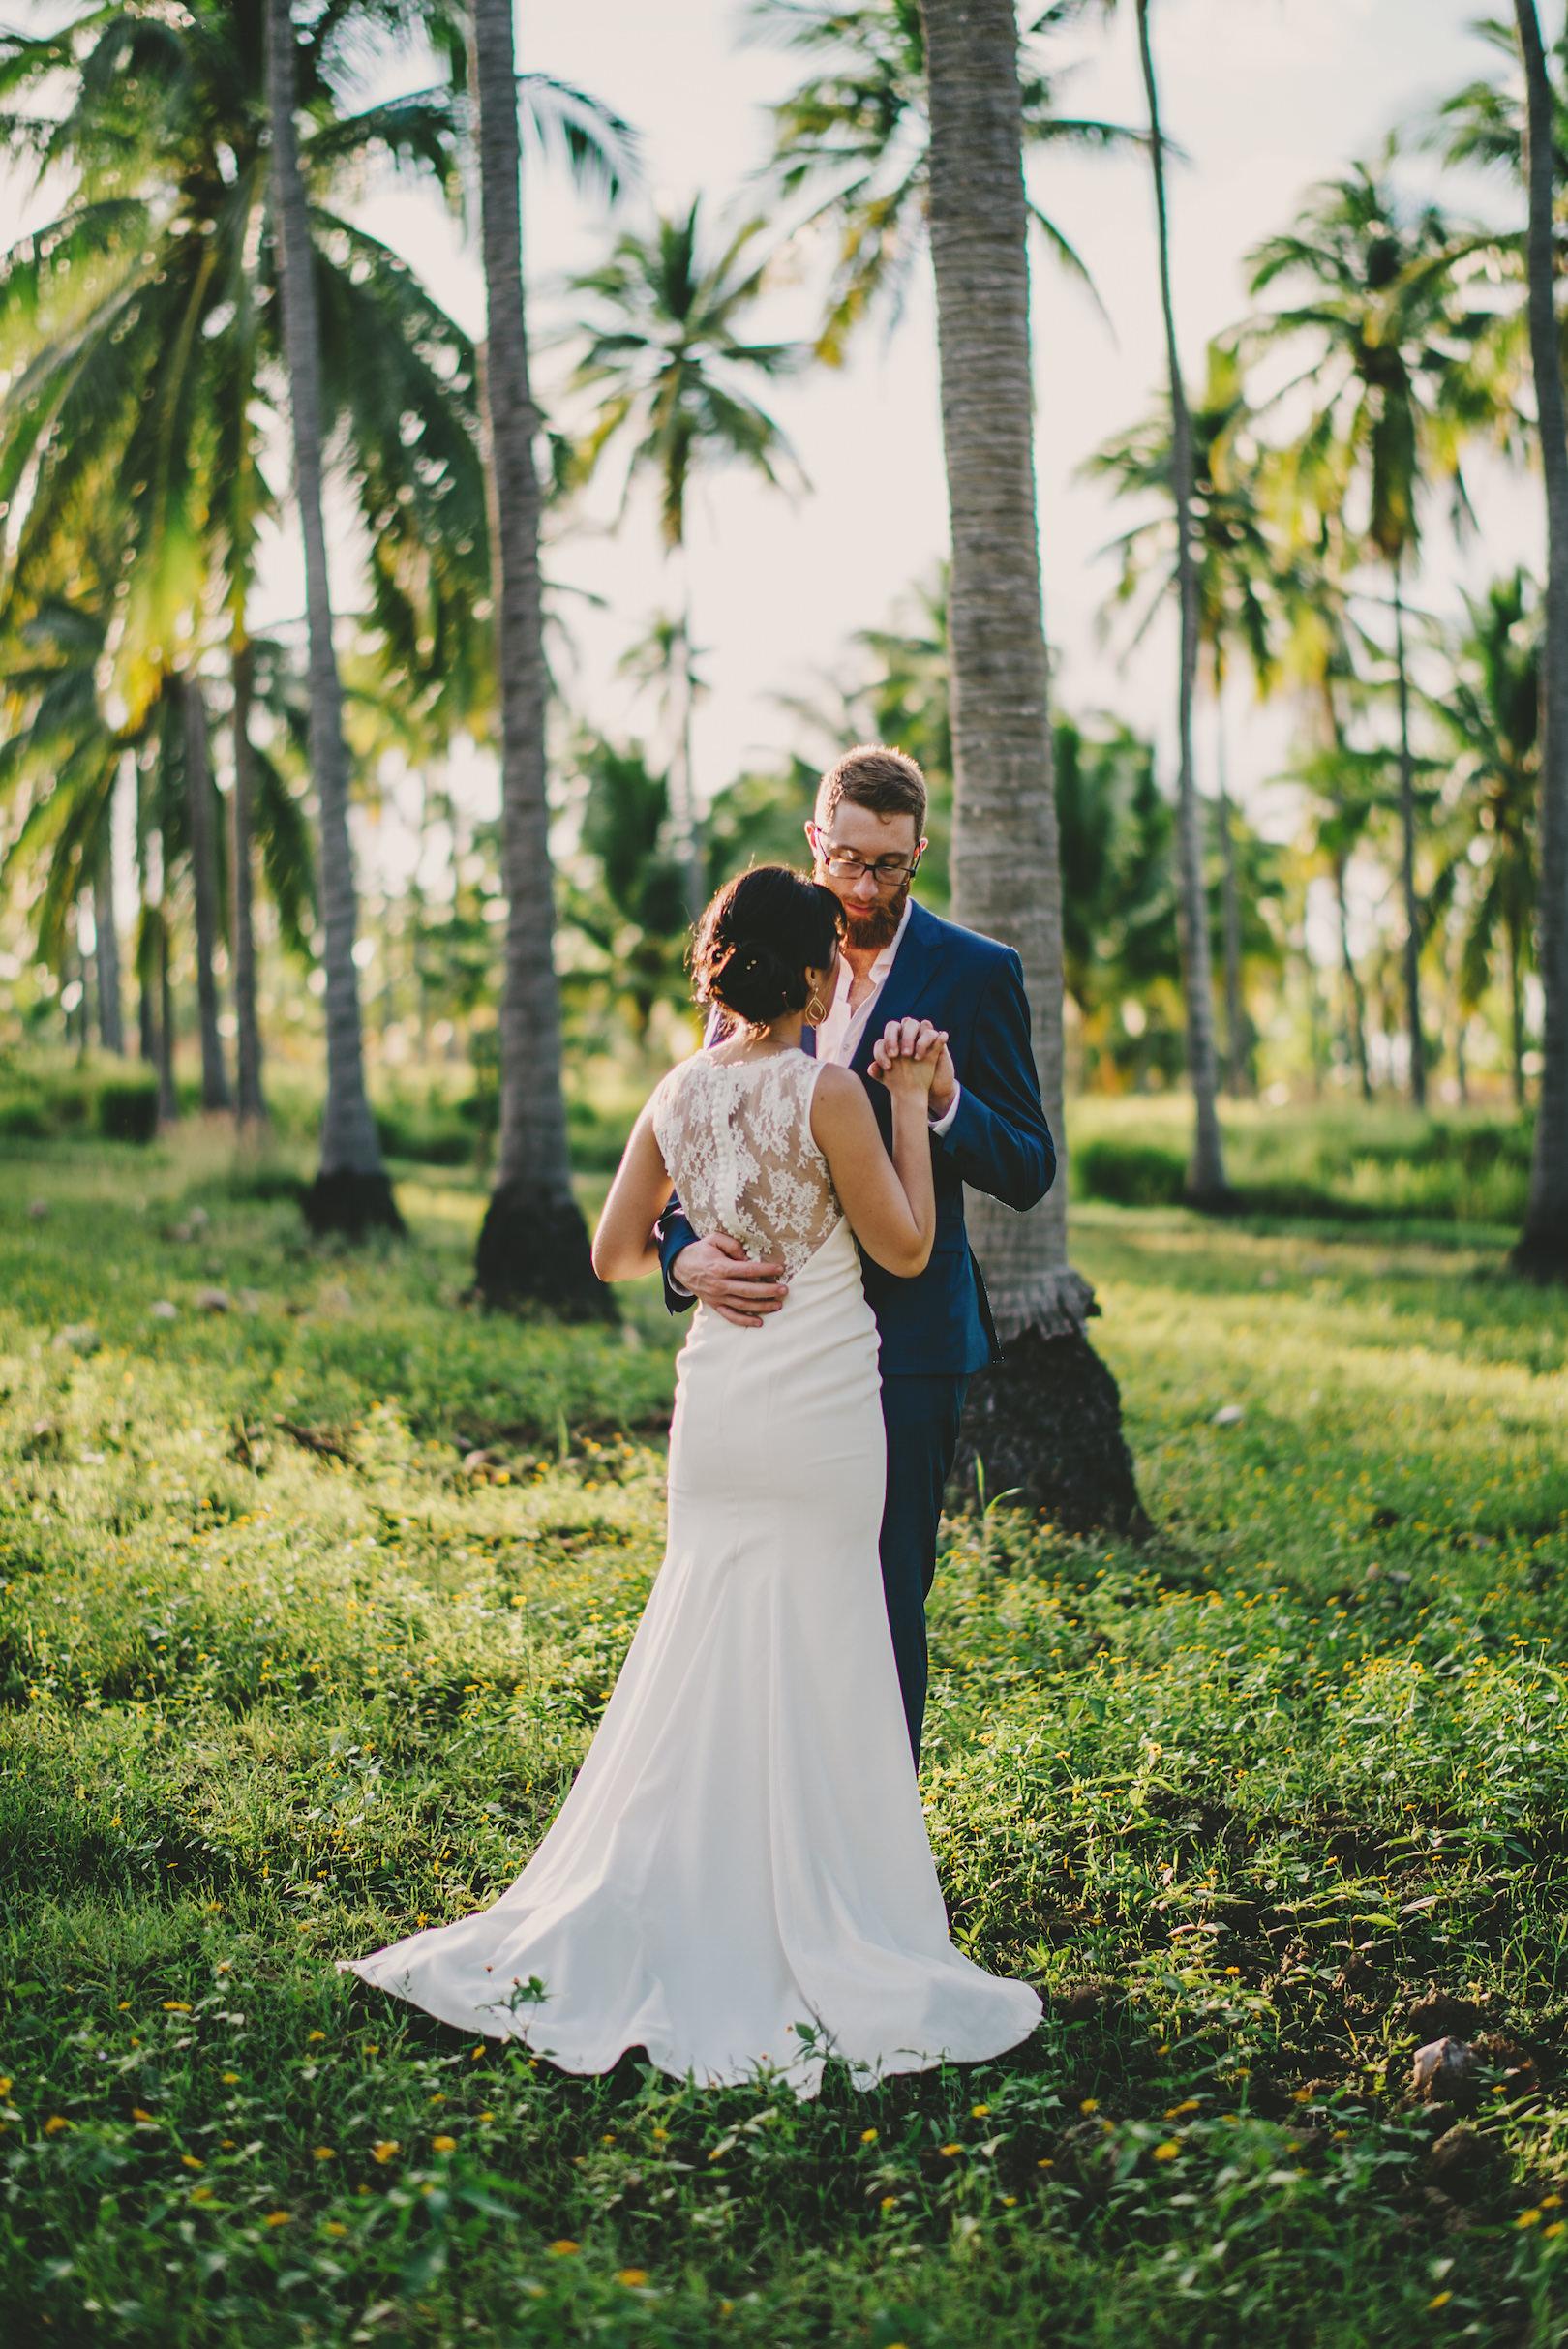 Nathan & Felicia - Wedding Day - © Dallas Kolotylo Photography - 484